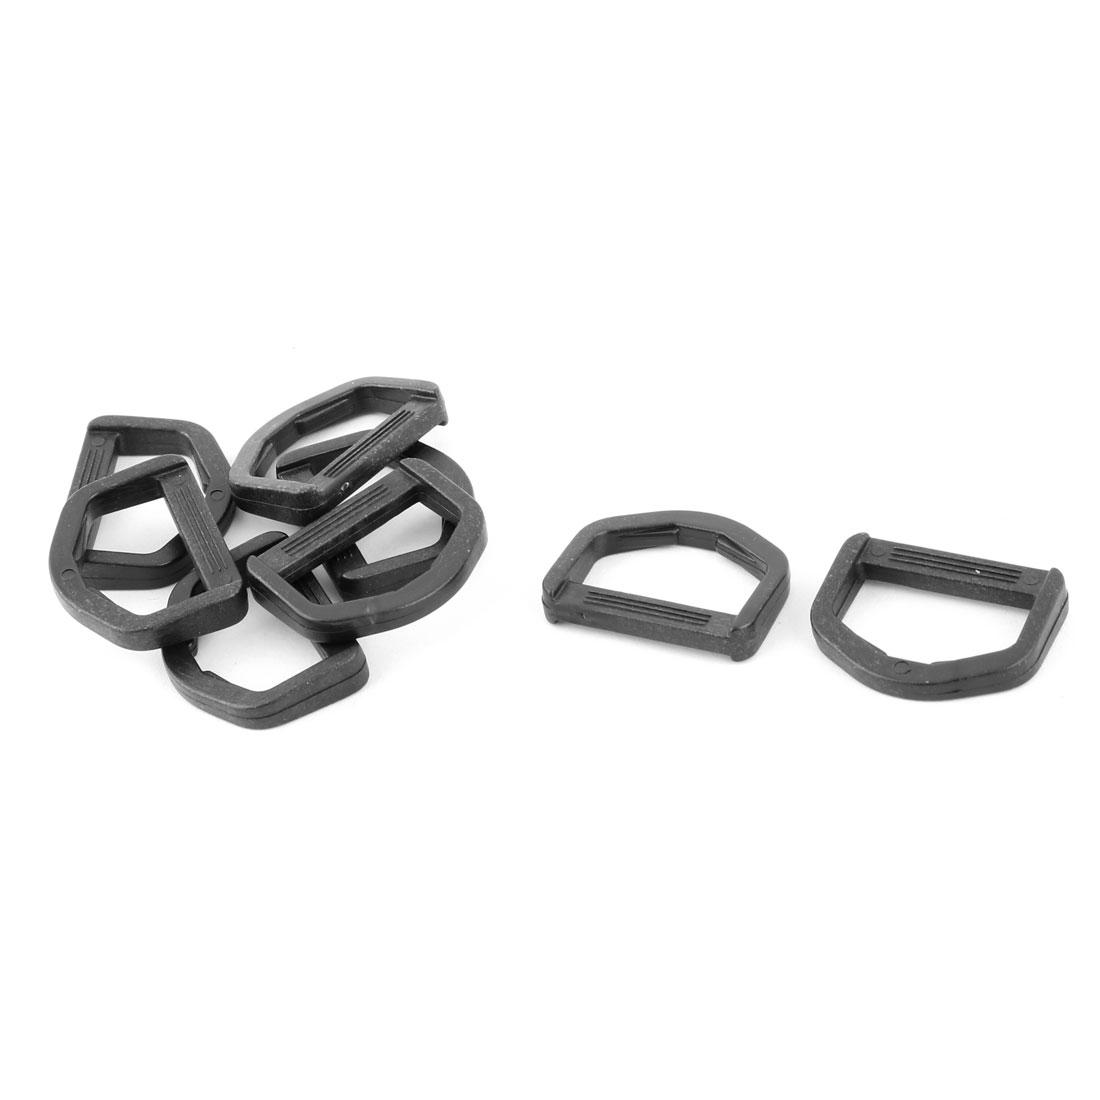 Backpack Plastic D Shaped Webbing Belt Strap Connecting Ring Buckle Black 8pcs